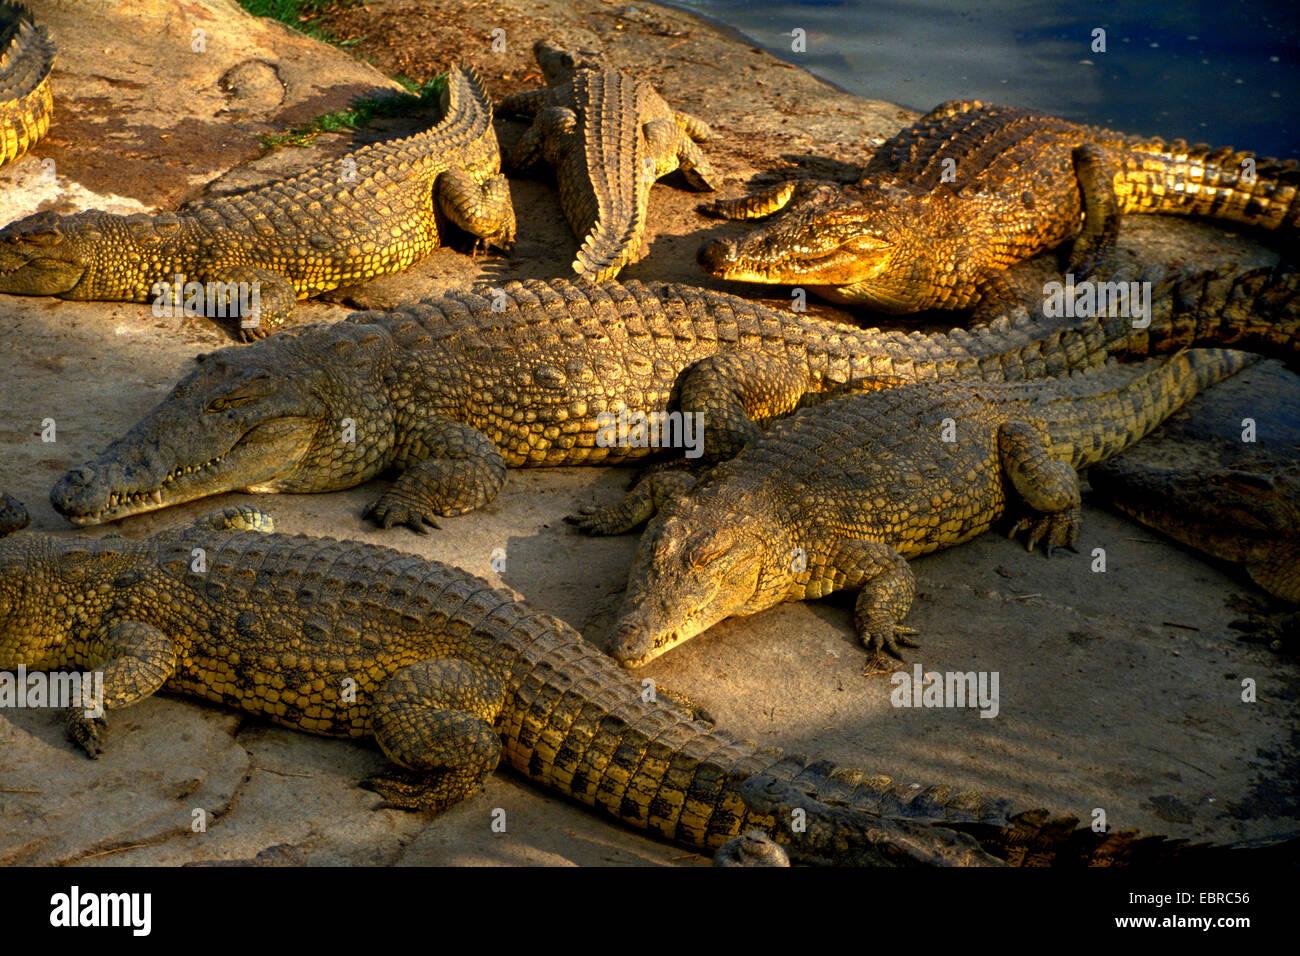 Nile crocodile (Crocodylus niloticus), several Nile crocodiles on the shore, Cote d'Ivoire, Yamoussoukro - Stock Image